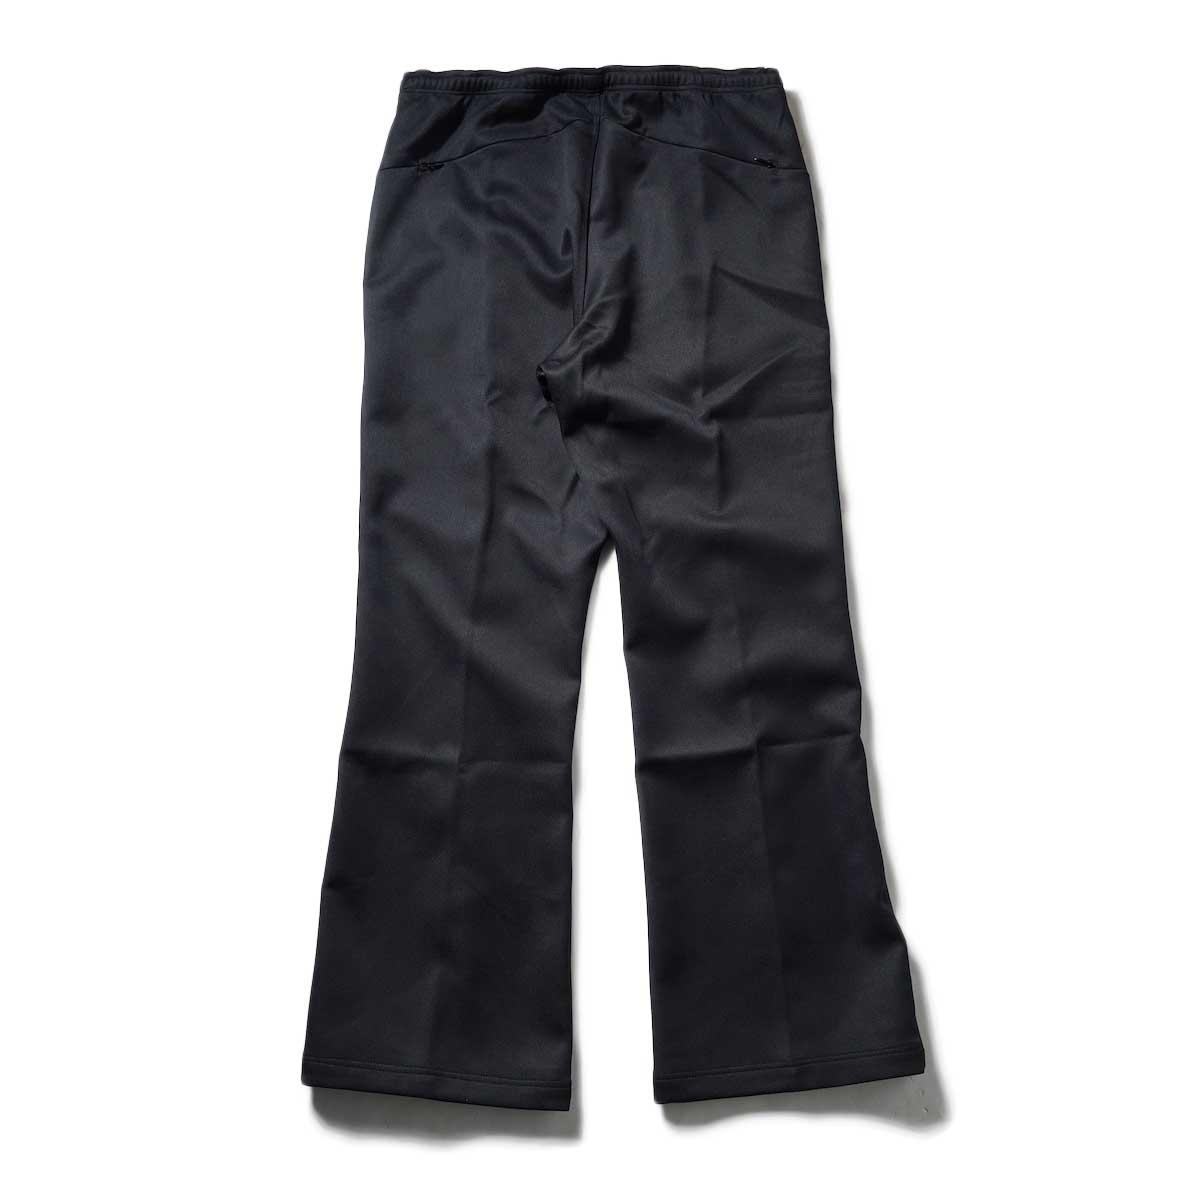 Needles / W.U. BOOT-CUT PANT - PE/R DOESKIN (Black)背面